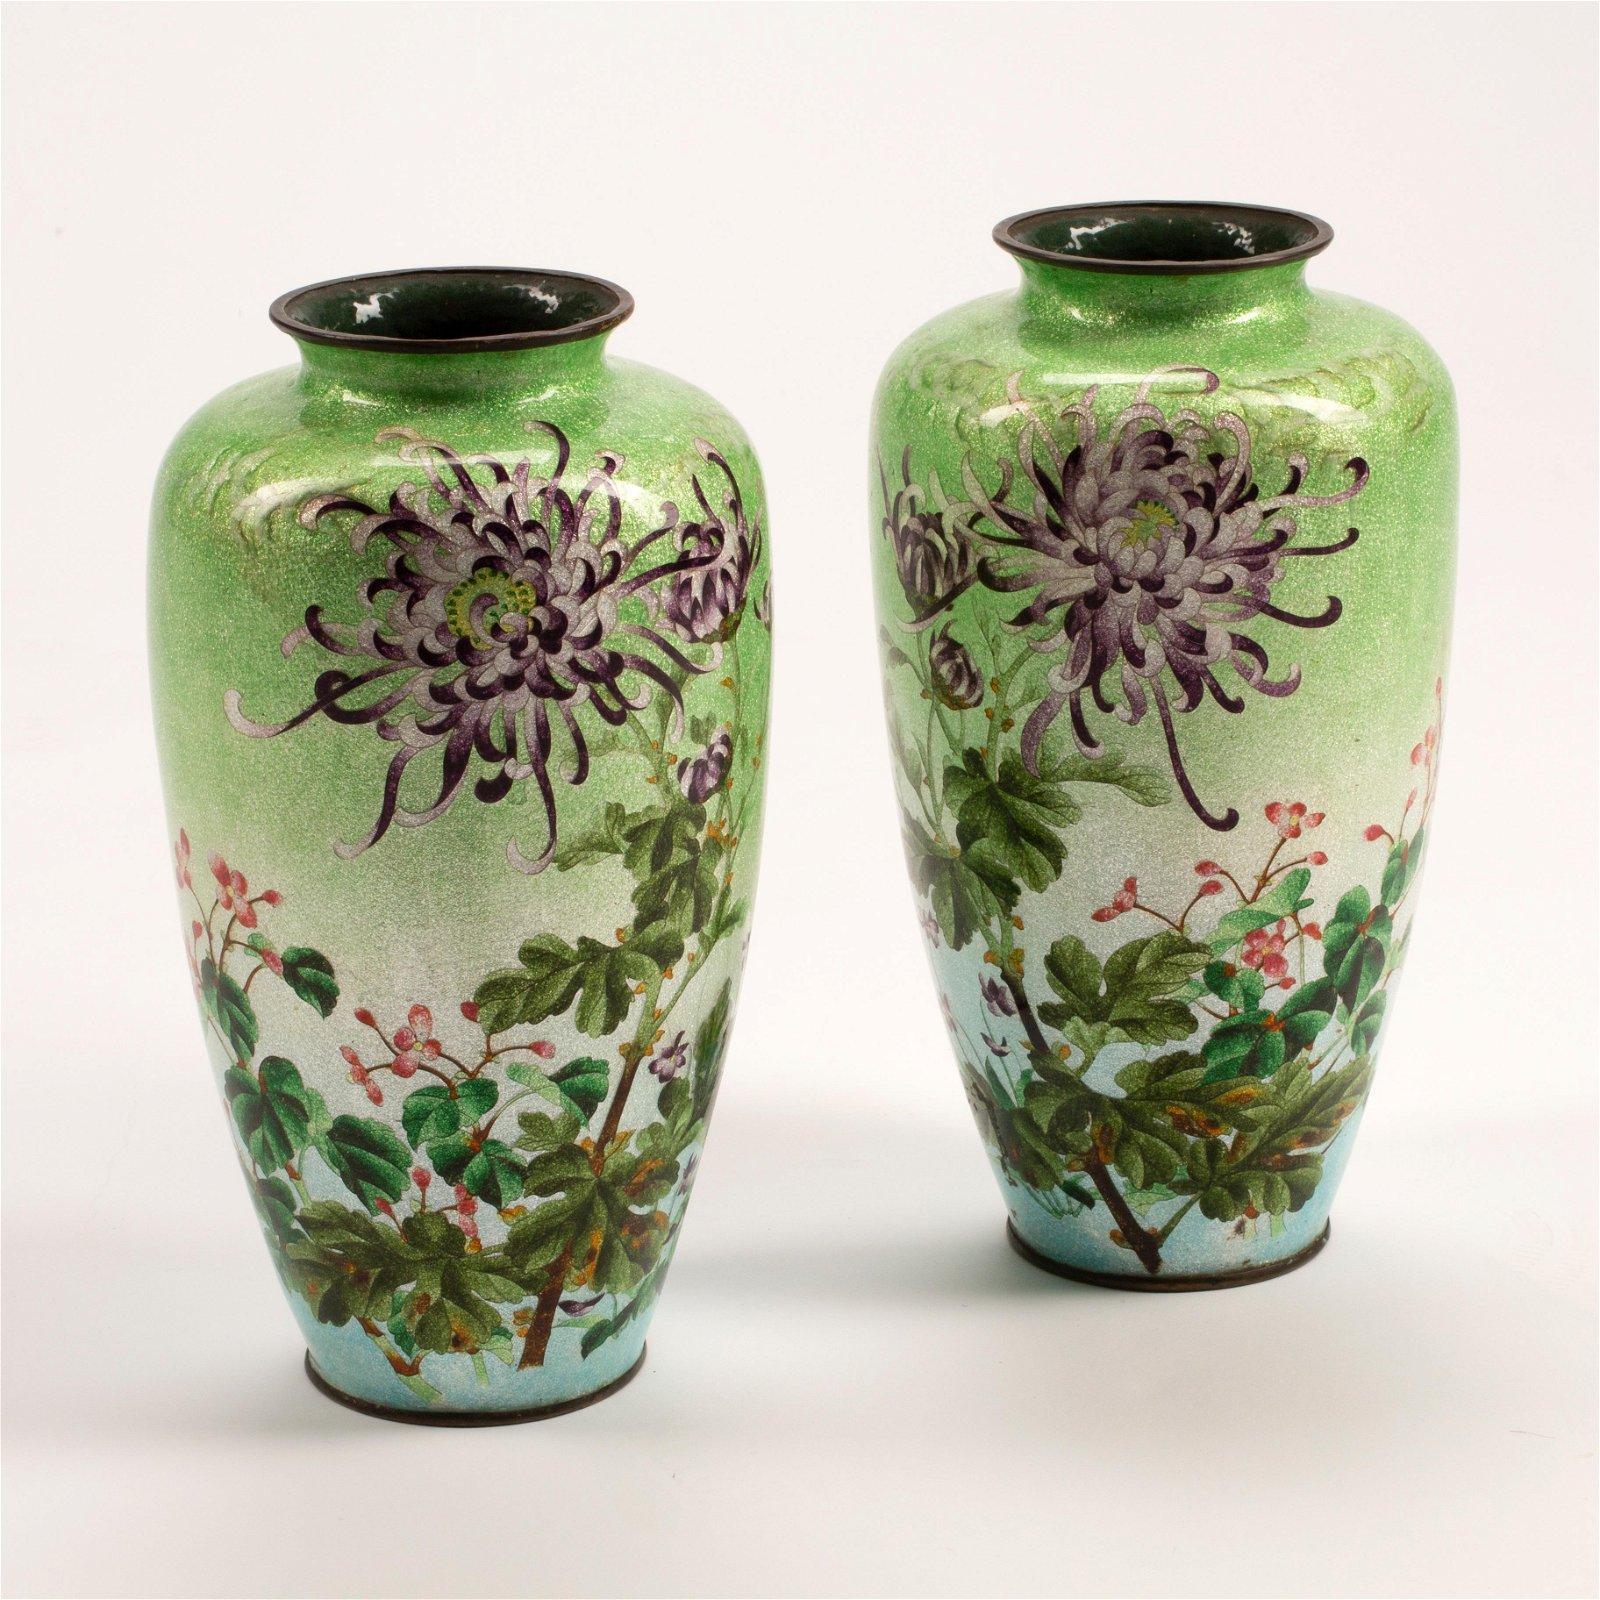 19th Century Enamel on Copper Vase Pair.